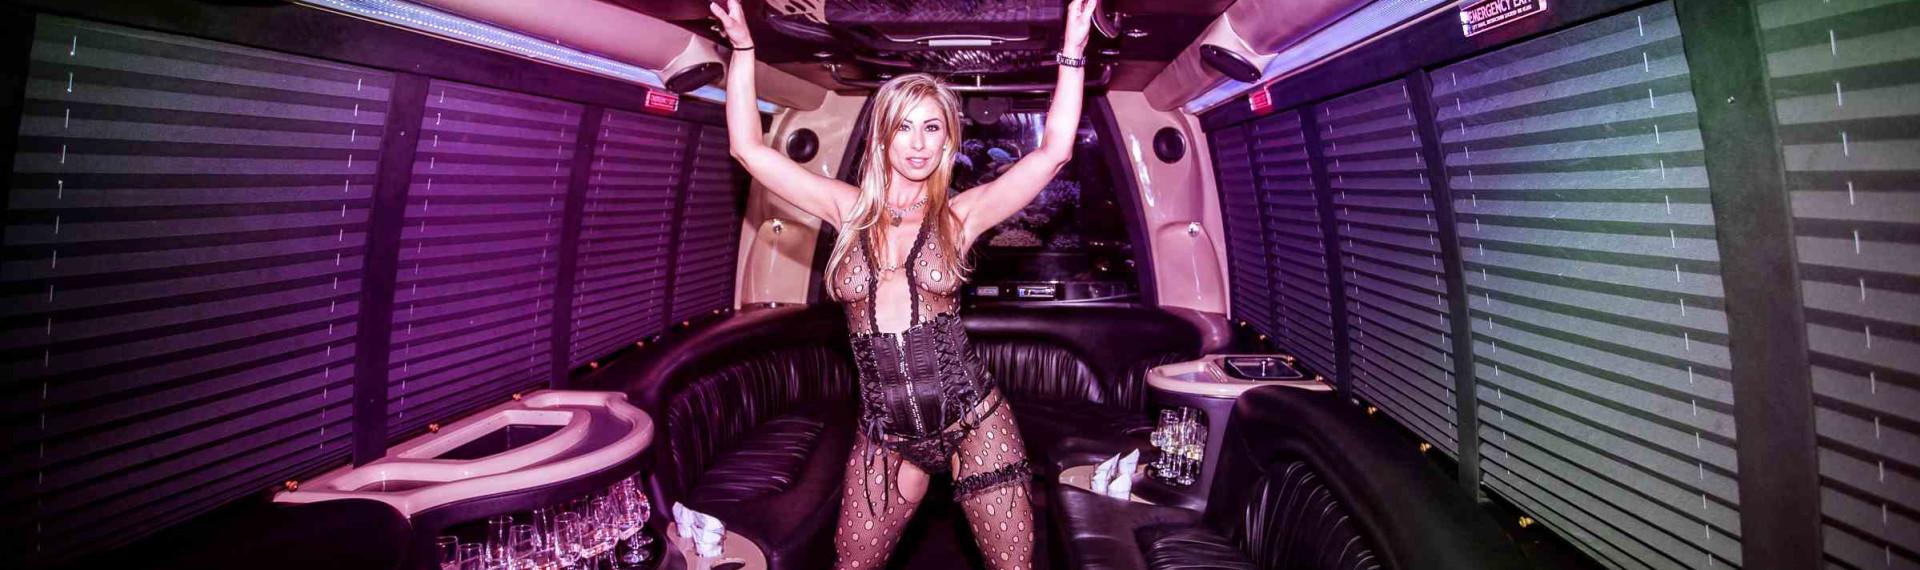 Strip Party Bus Cologne